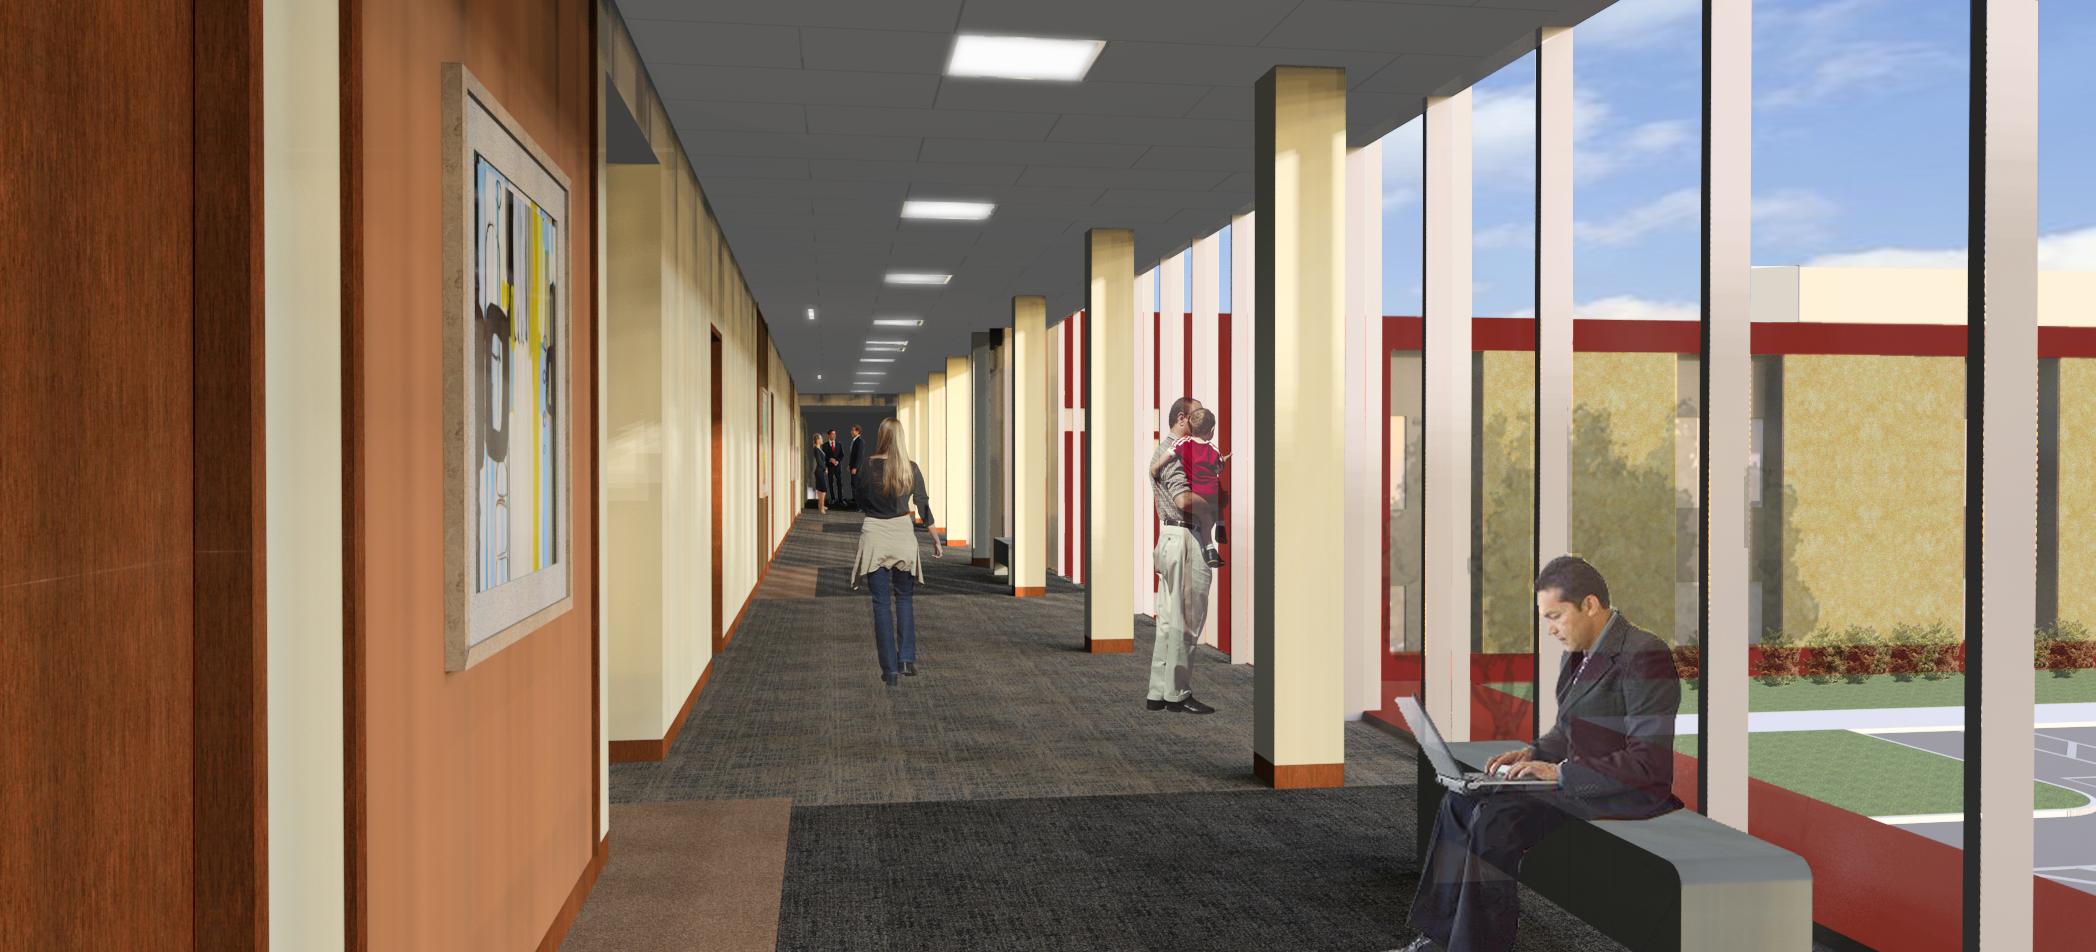 Hallway View 1-1